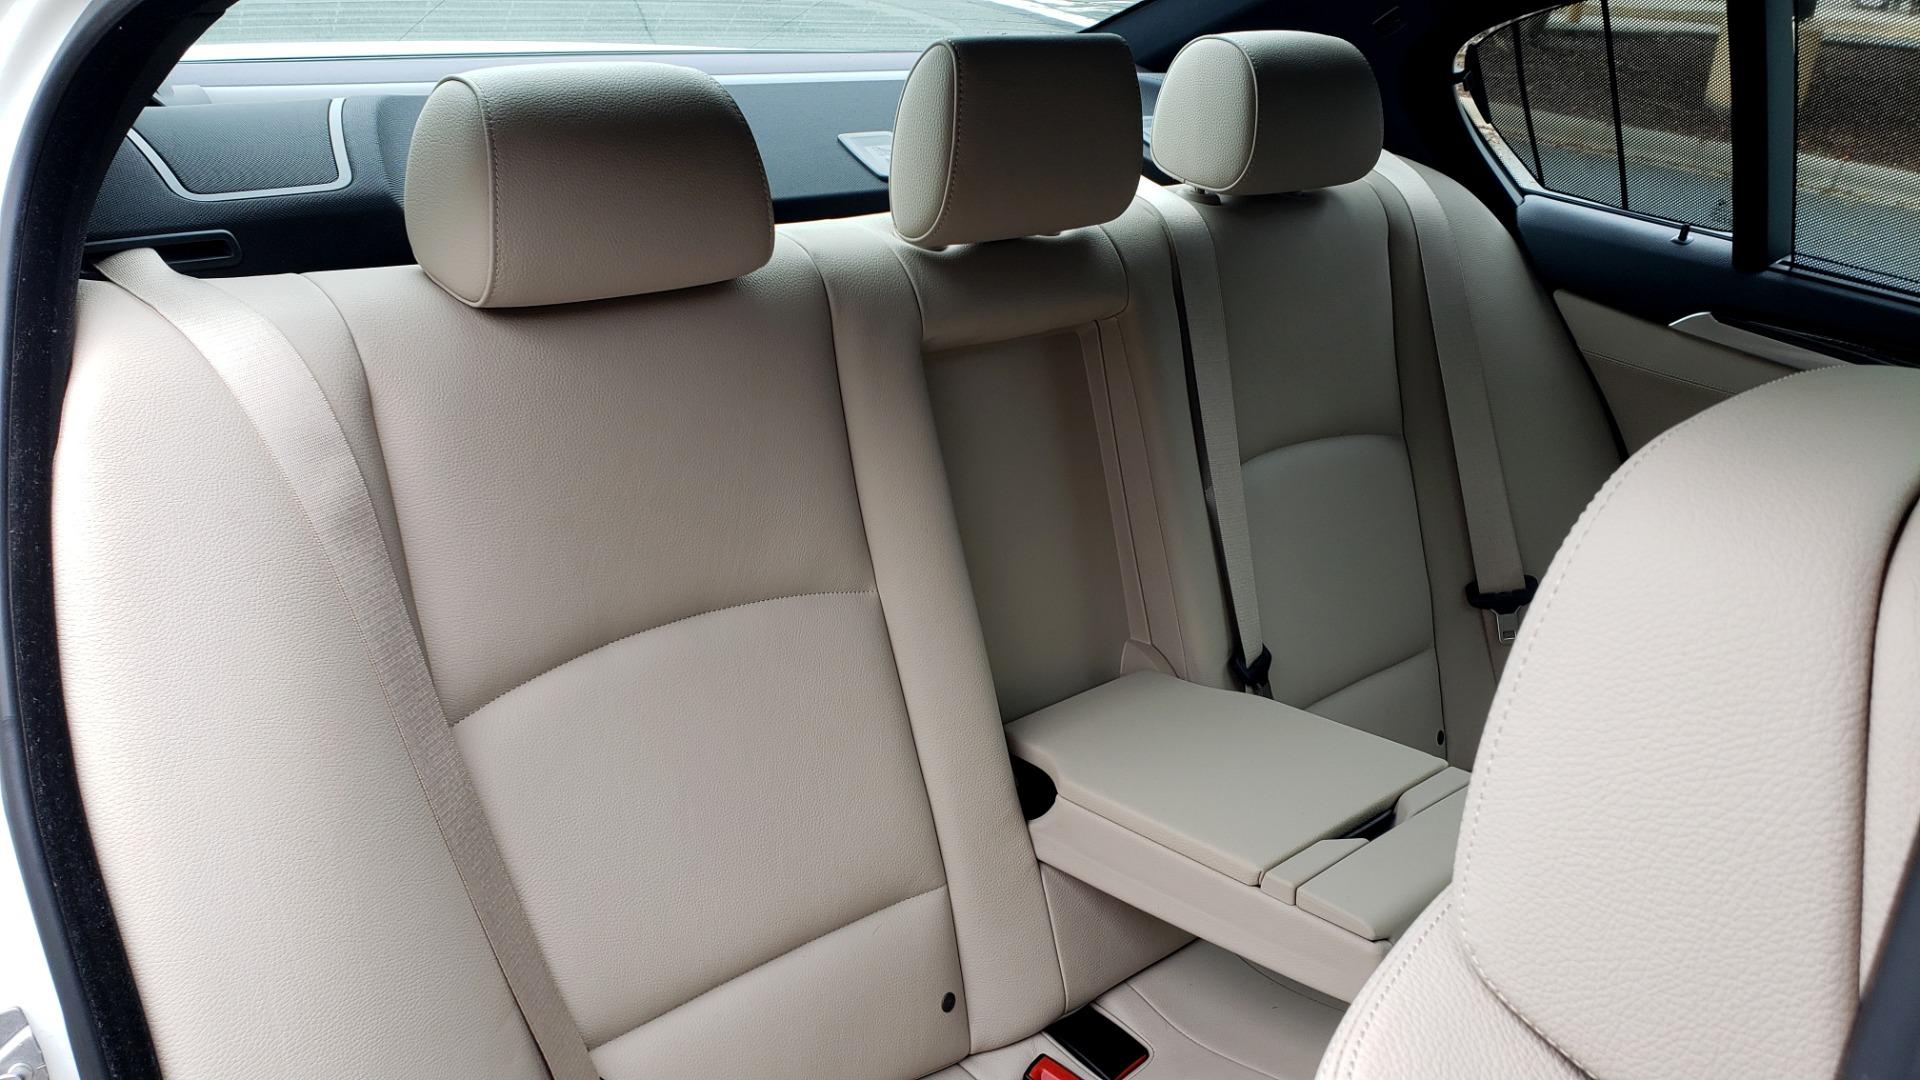 Used 2012 BMW 5 SERIES 550I M SPORT / NAV / CONV PKG / SUNROOF / PREM SND / REARVIEW for sale Sold at Formula Imports in Charlotte NC 28227 60